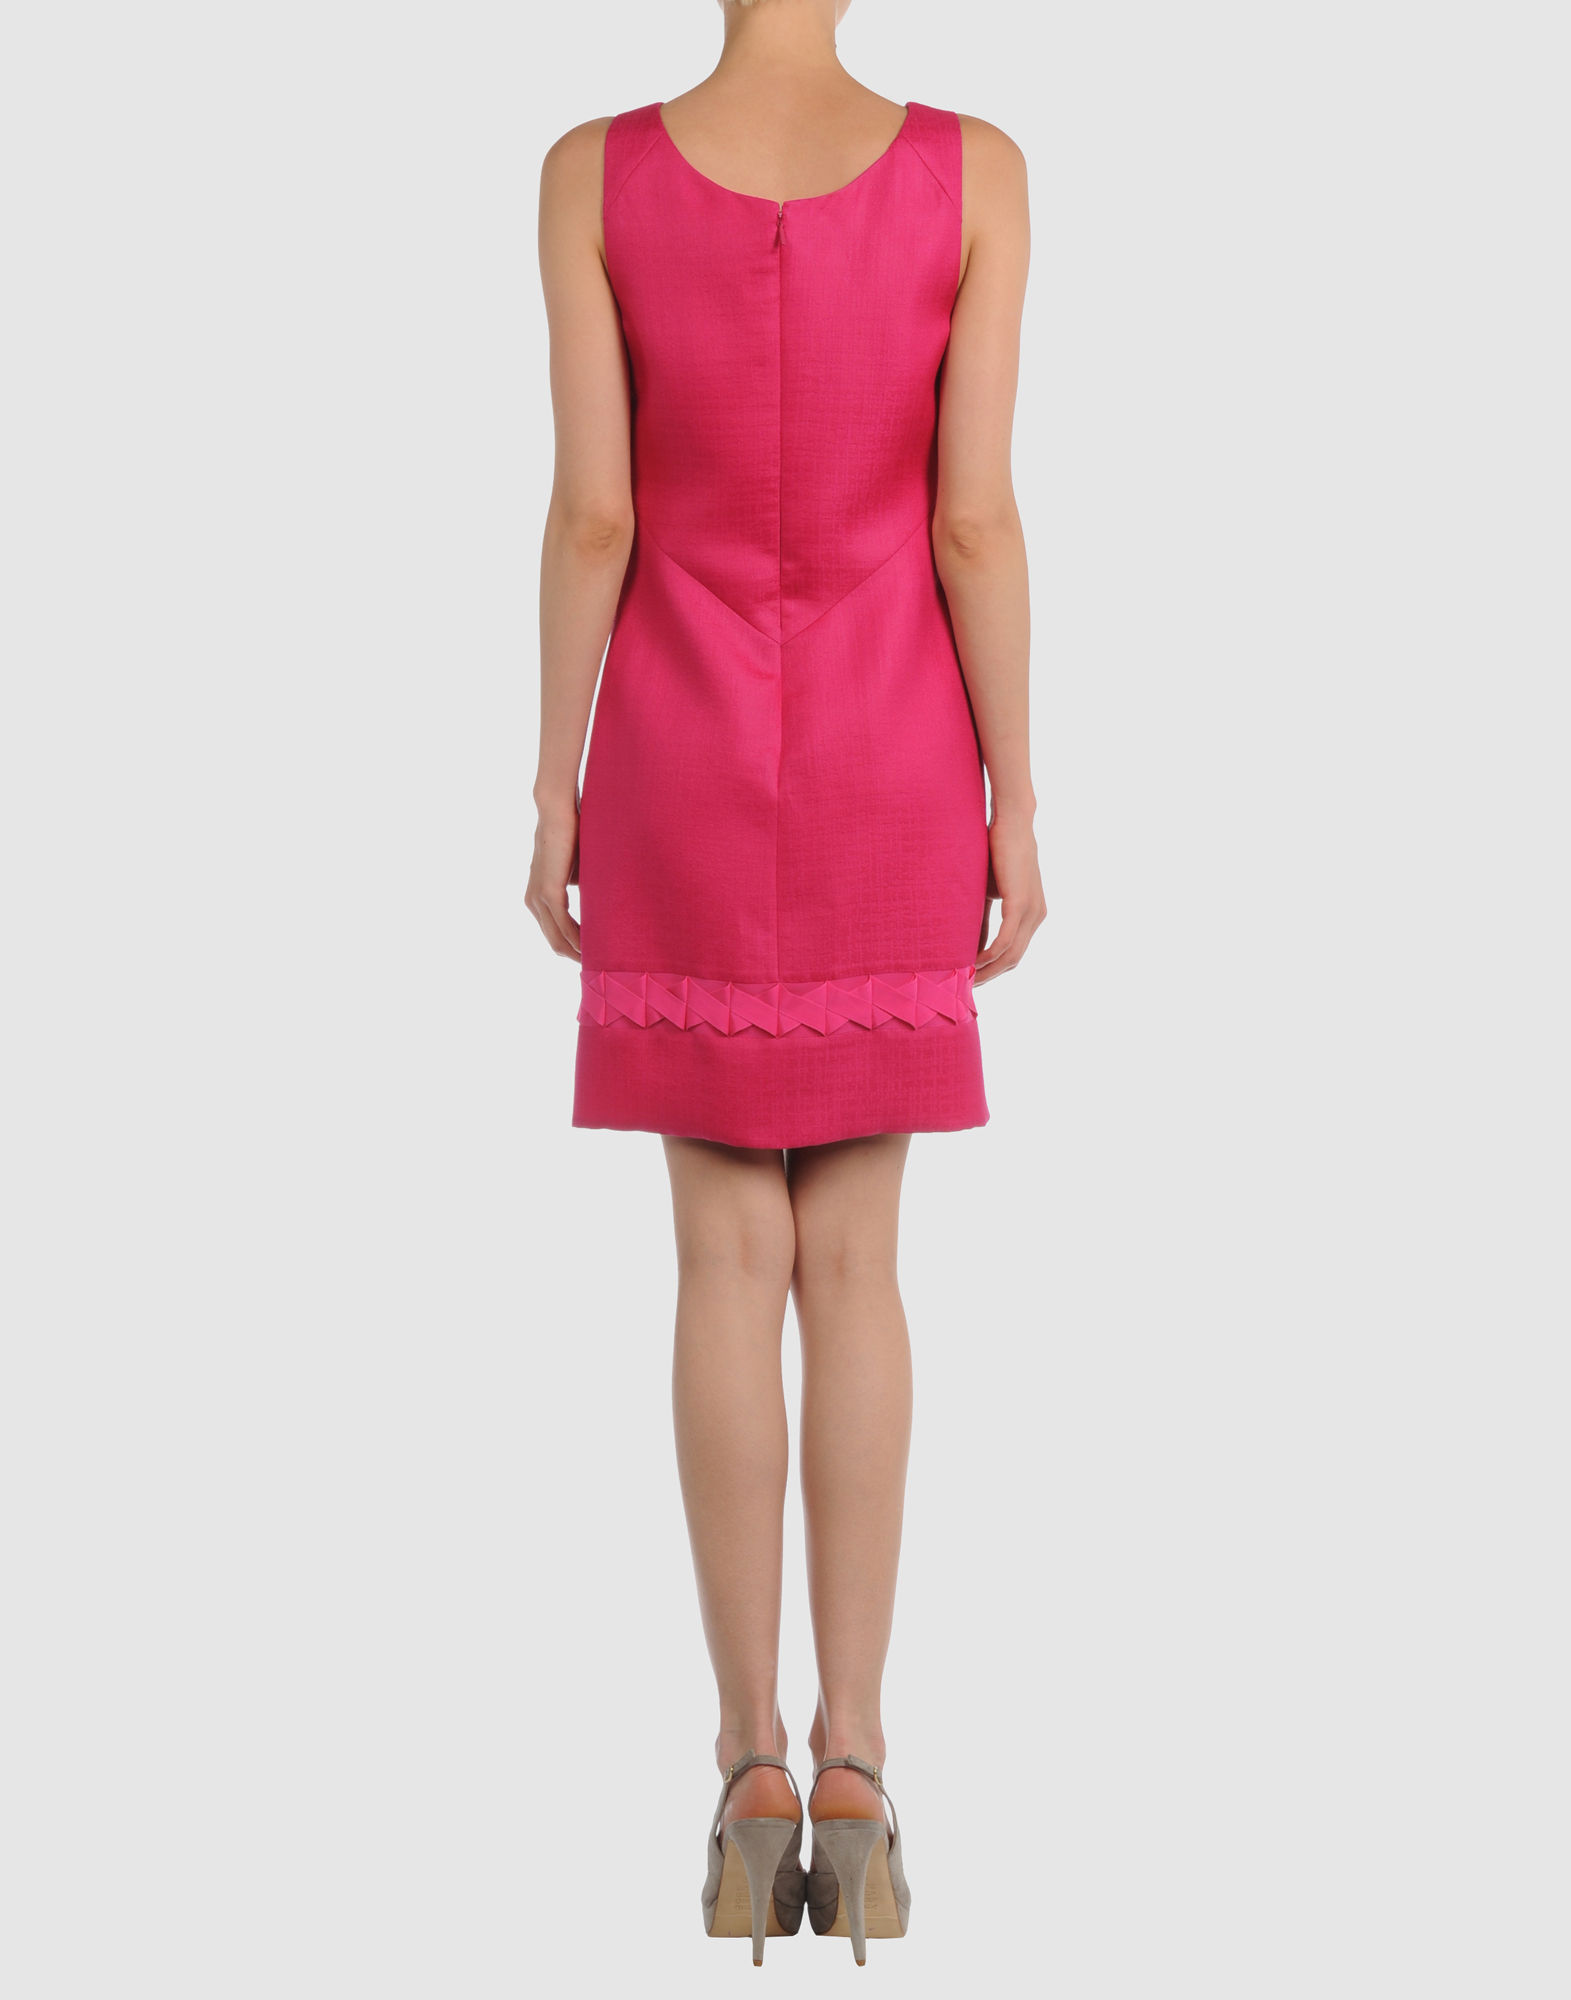 34215473SR 14 r - Evening Φορεματα Versace 2011 2012 Κωδ.35